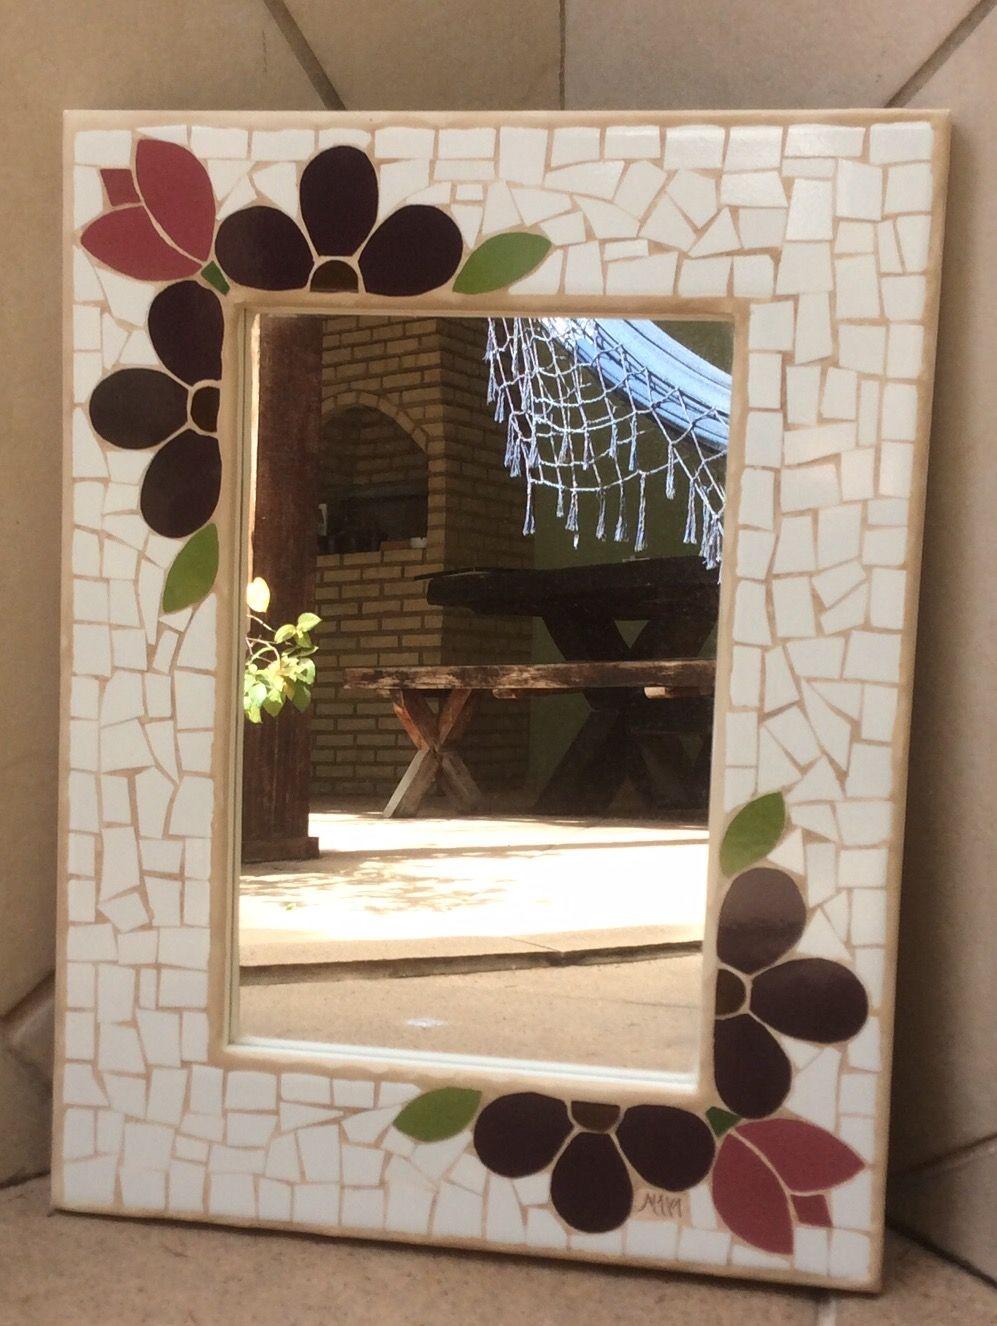 Pin de Nicolas Javier Gomez Botero en espejos | Pinterest | Mosaicos ...